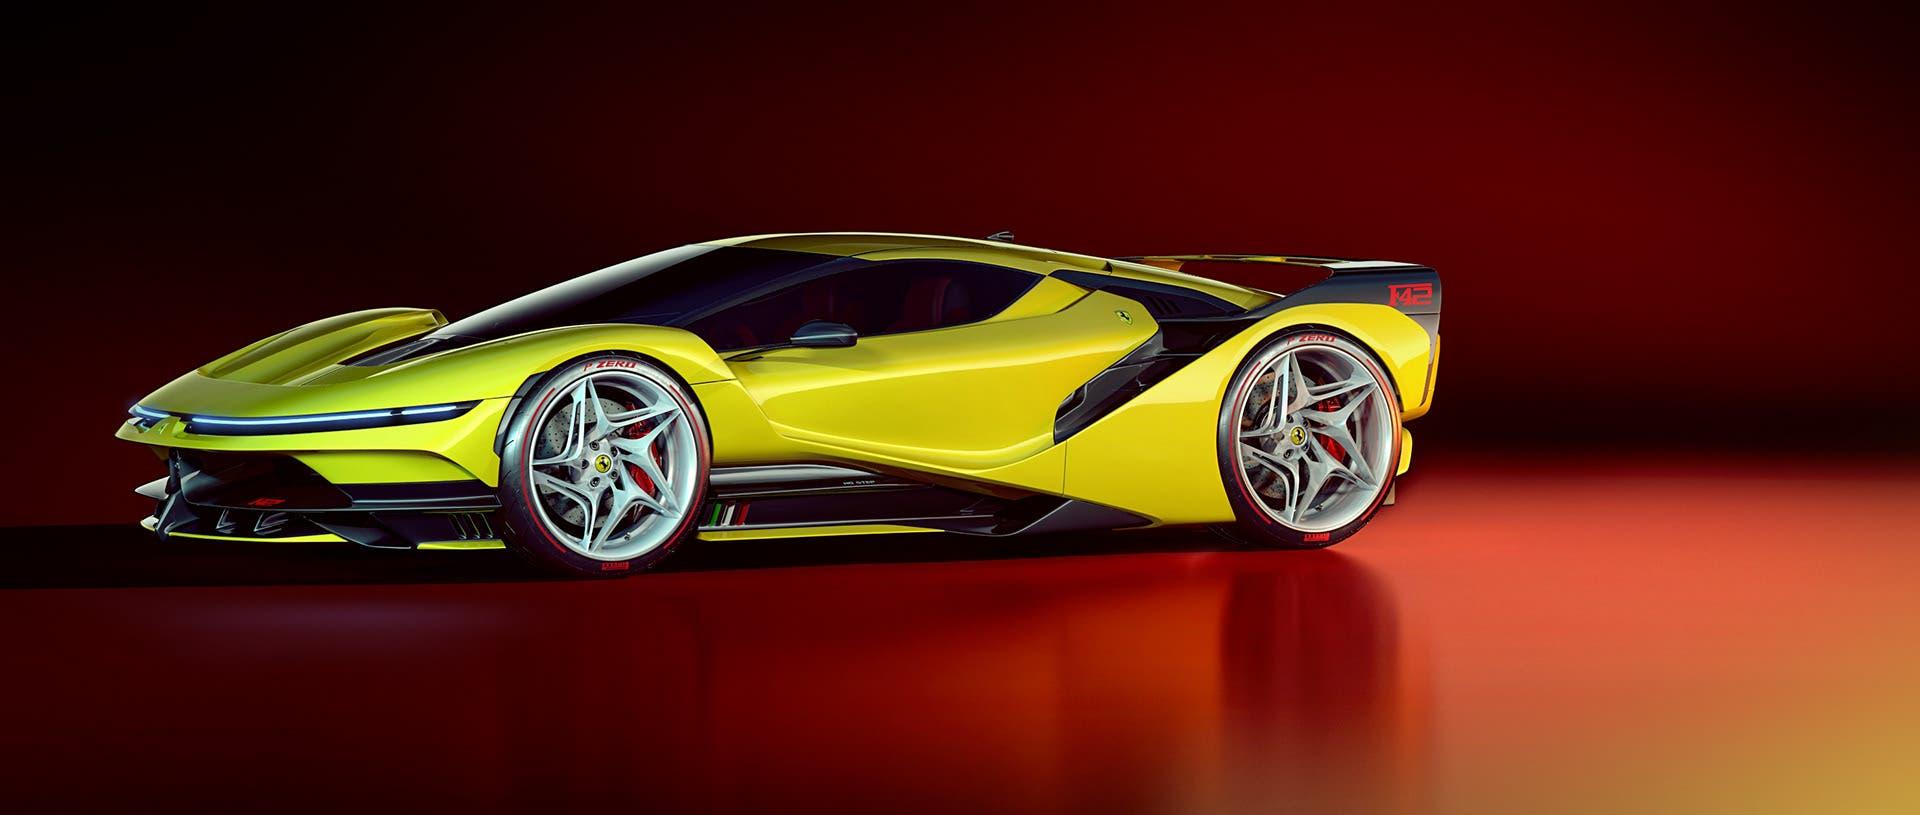 Ferrari F42 concept